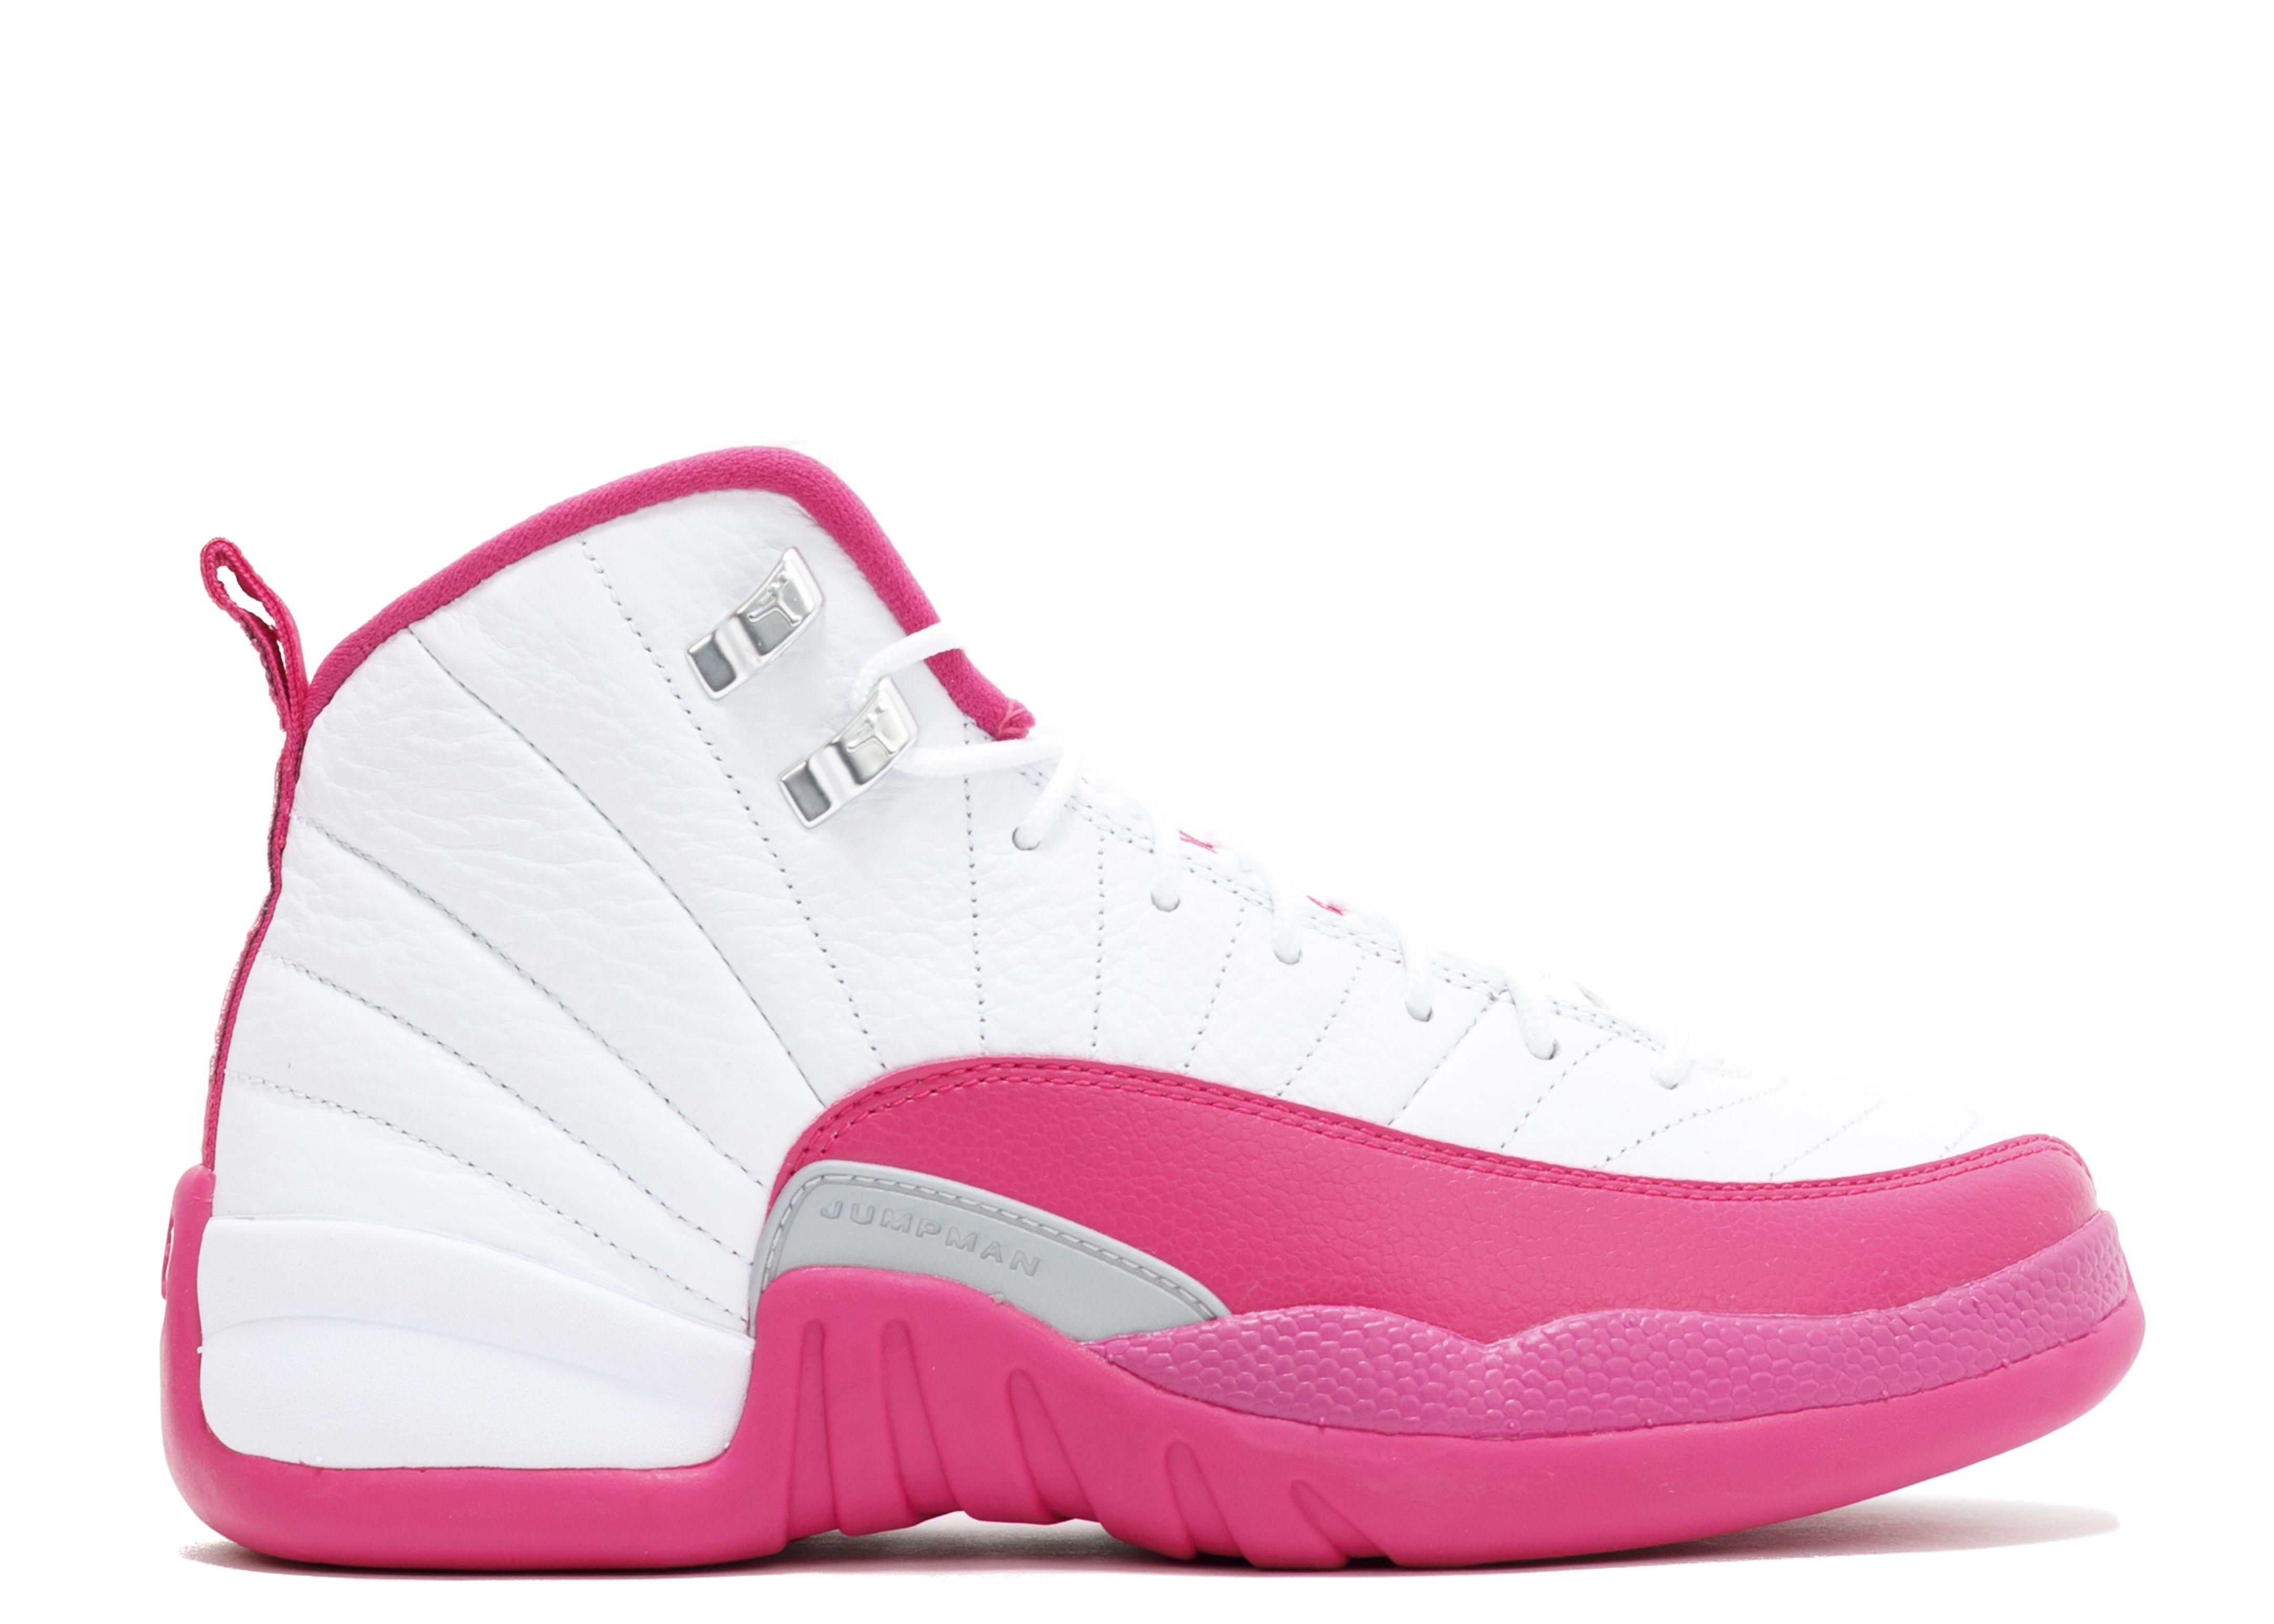 meet 4a886 61b2c Air Jordan 12 Retro GG  Vivid Pink